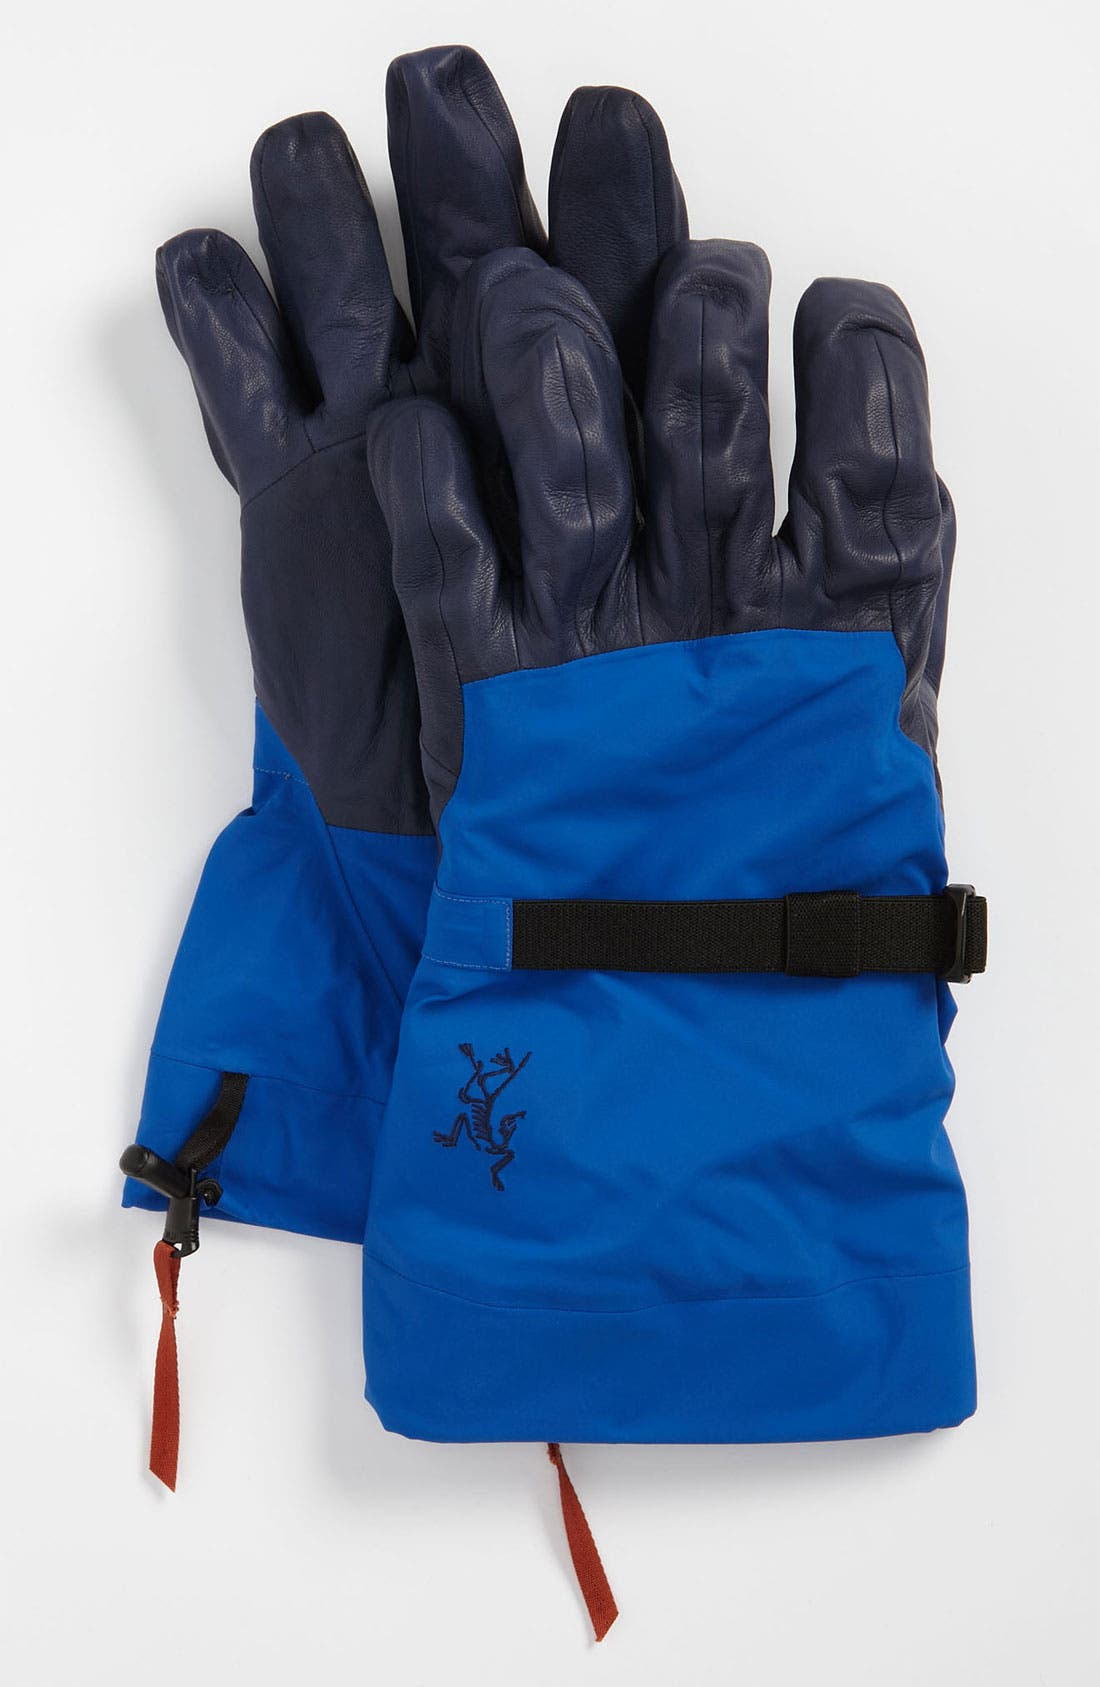 Alternate Image 1 Selected - Arc'teryx 'Alpha SV' Gloves